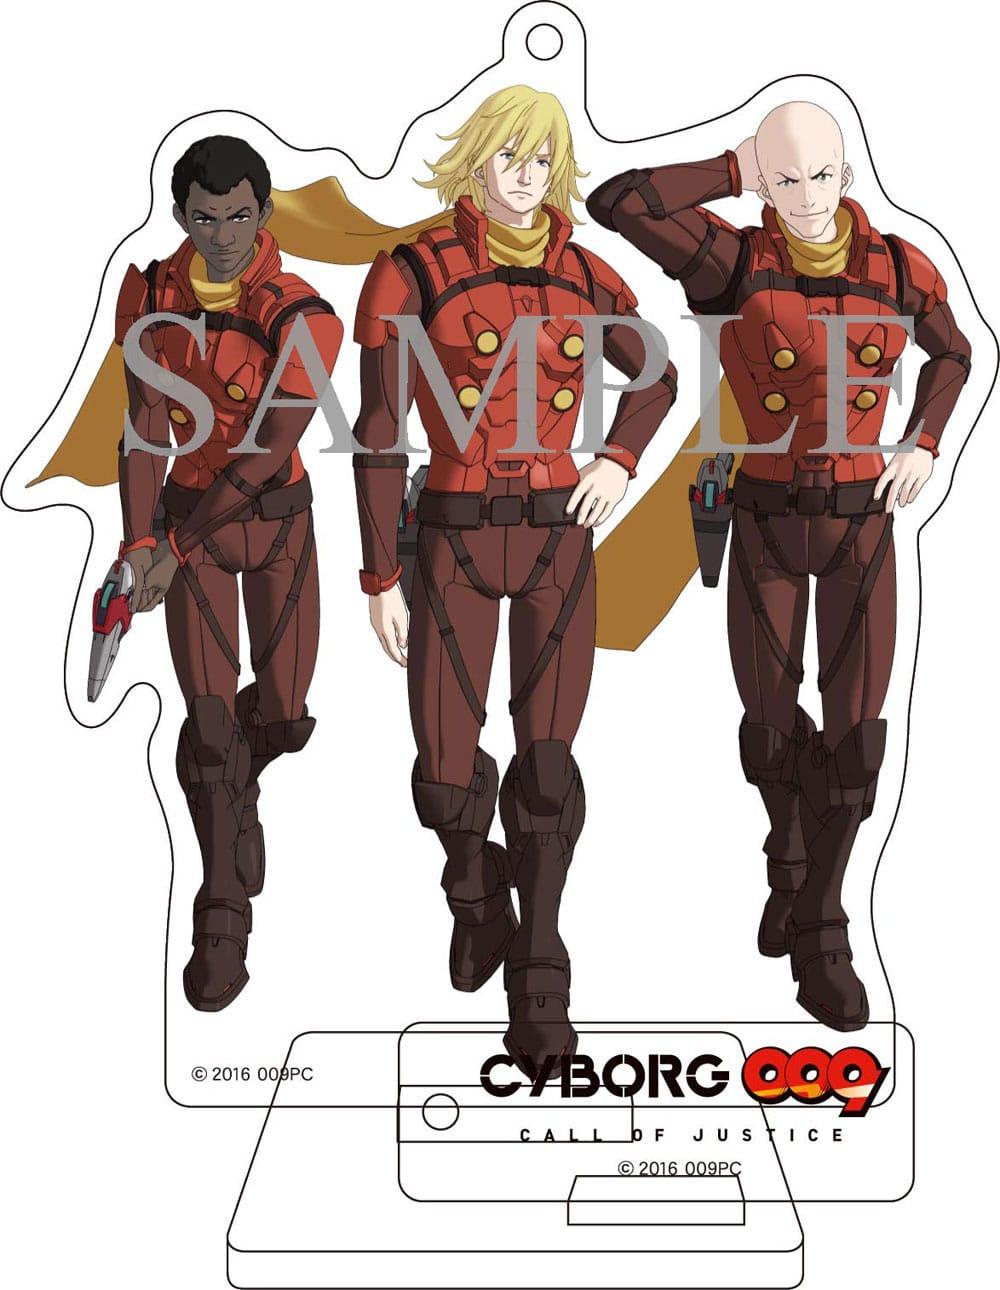 【TOHO animation STORE 限定版】CYBORG009 CALL OF JUSTICE Vol.2 DVD 初回生産限定版+オリジナルアクリルスタンディセット